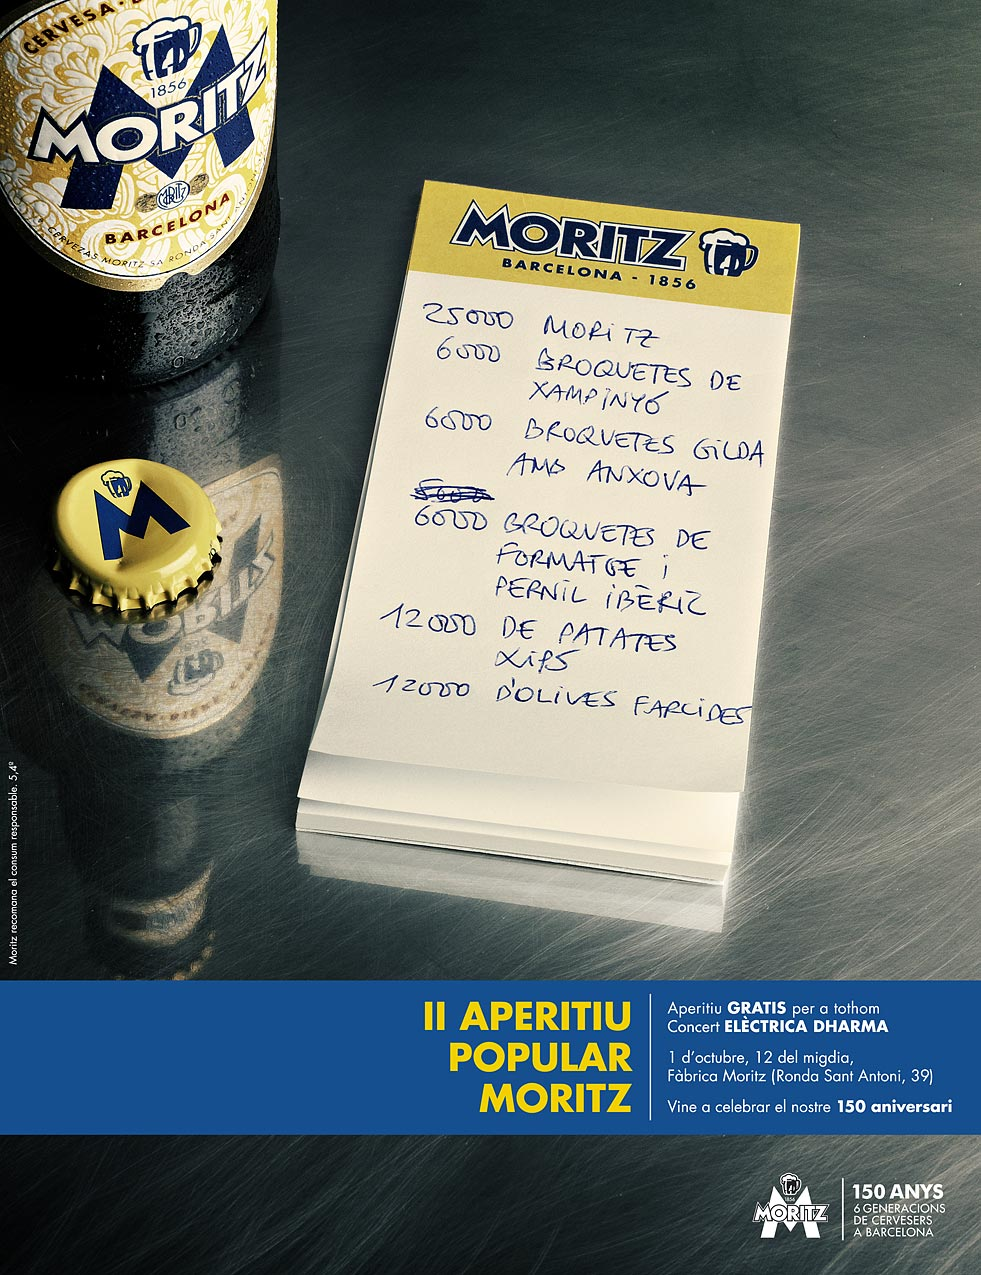 Moritz Aperitivo